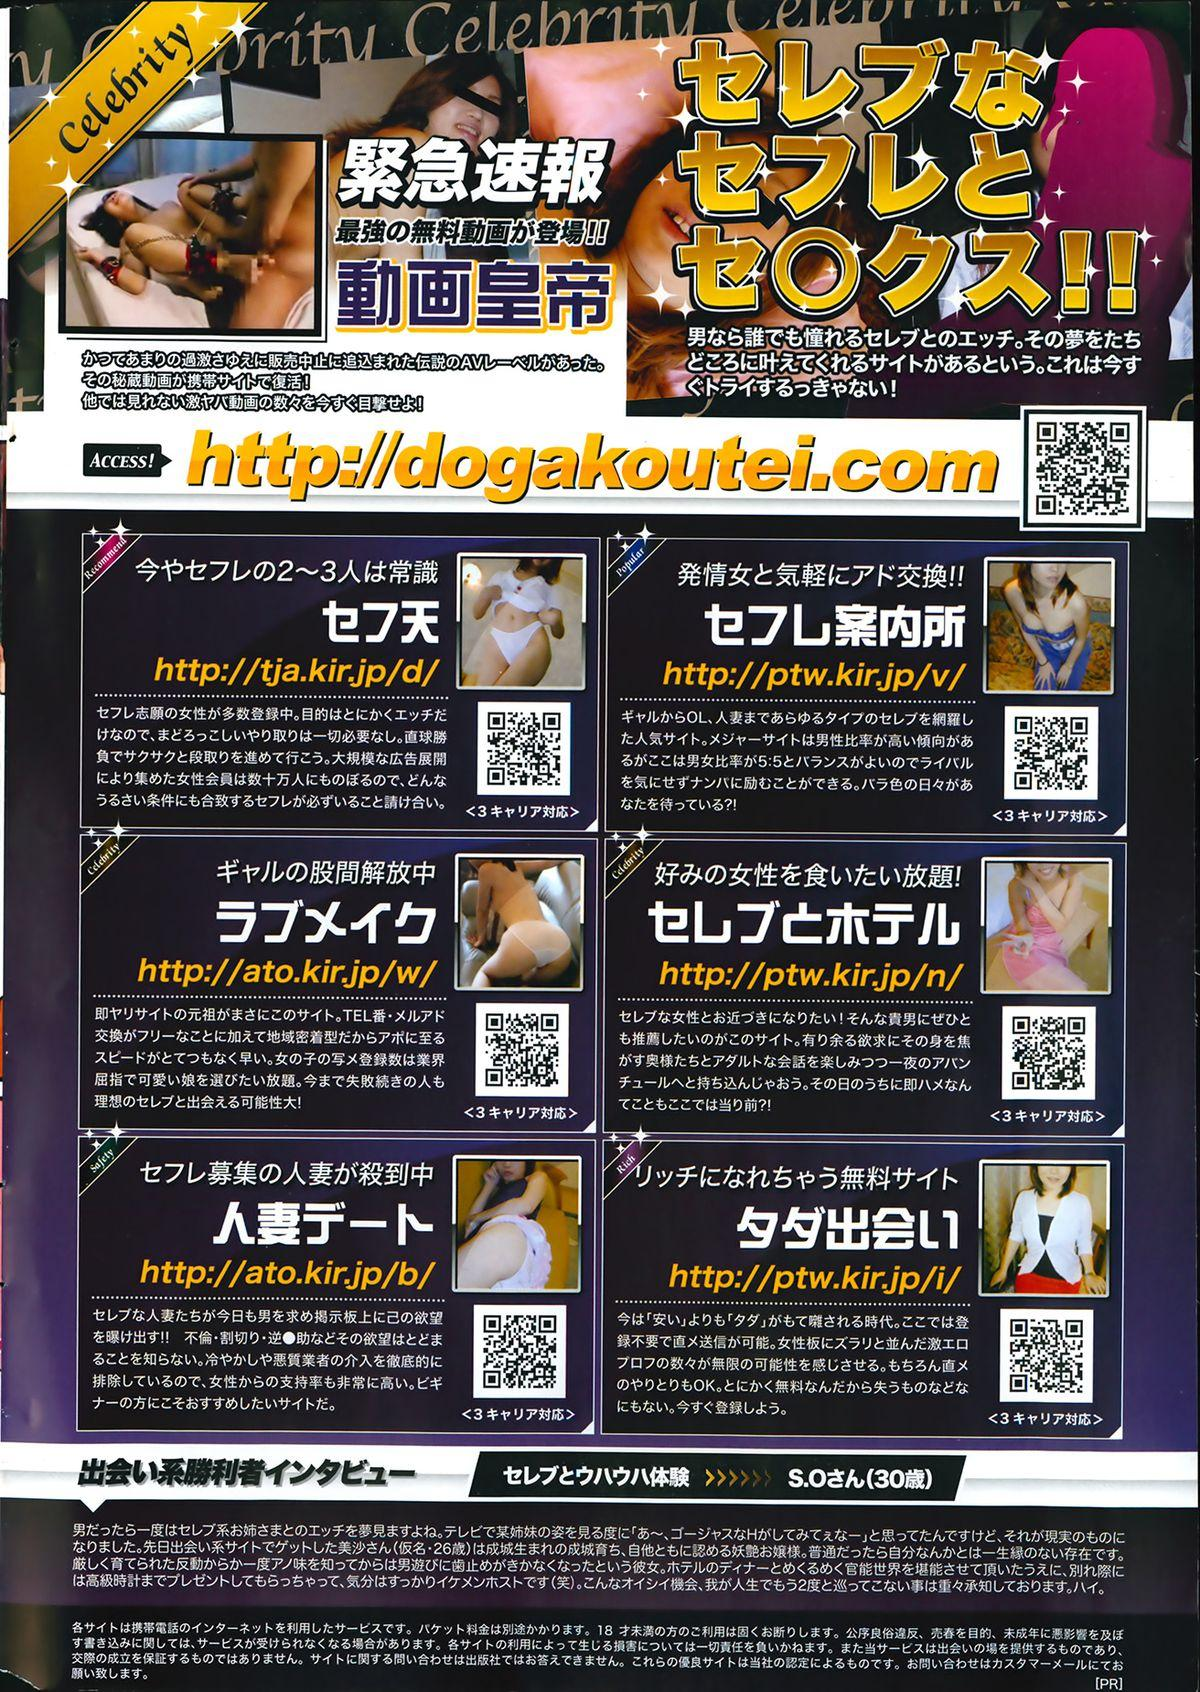 COMIC SIGMA 2014-03 Vol.78 278